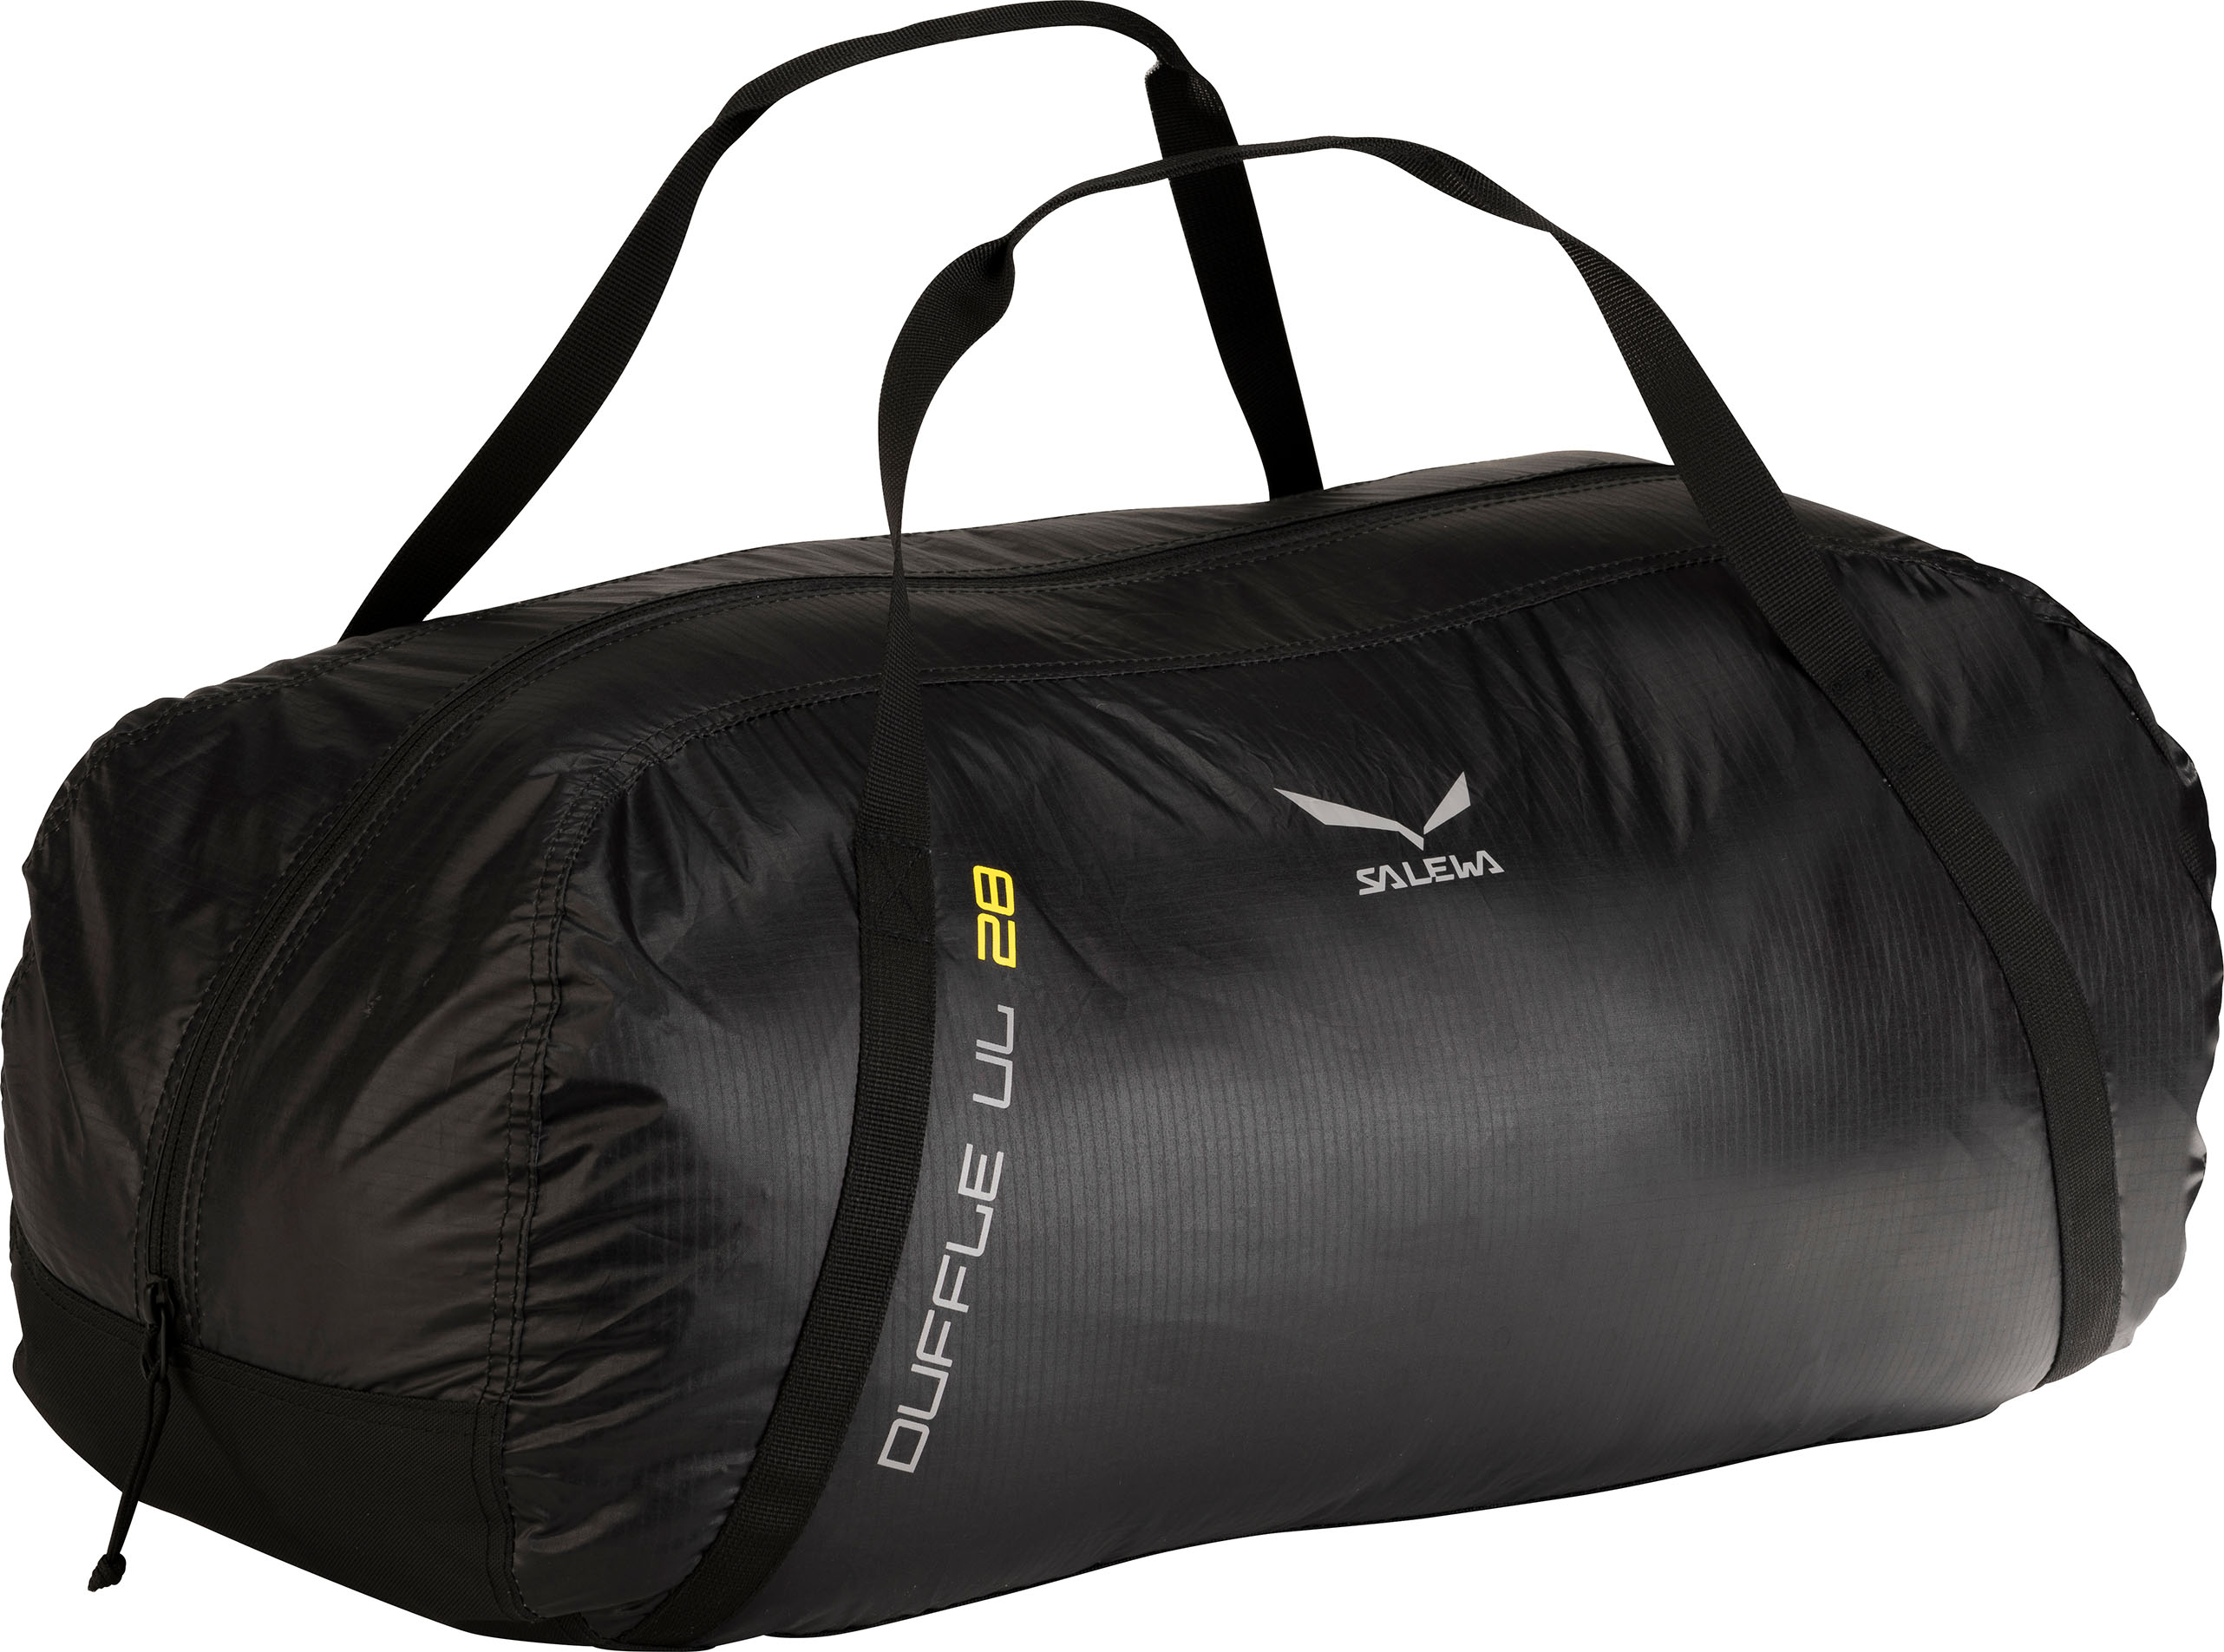 Купить со скидкой Сумка Salewa 2017 Ultra Light Duffle Bag Ul 28 Black /